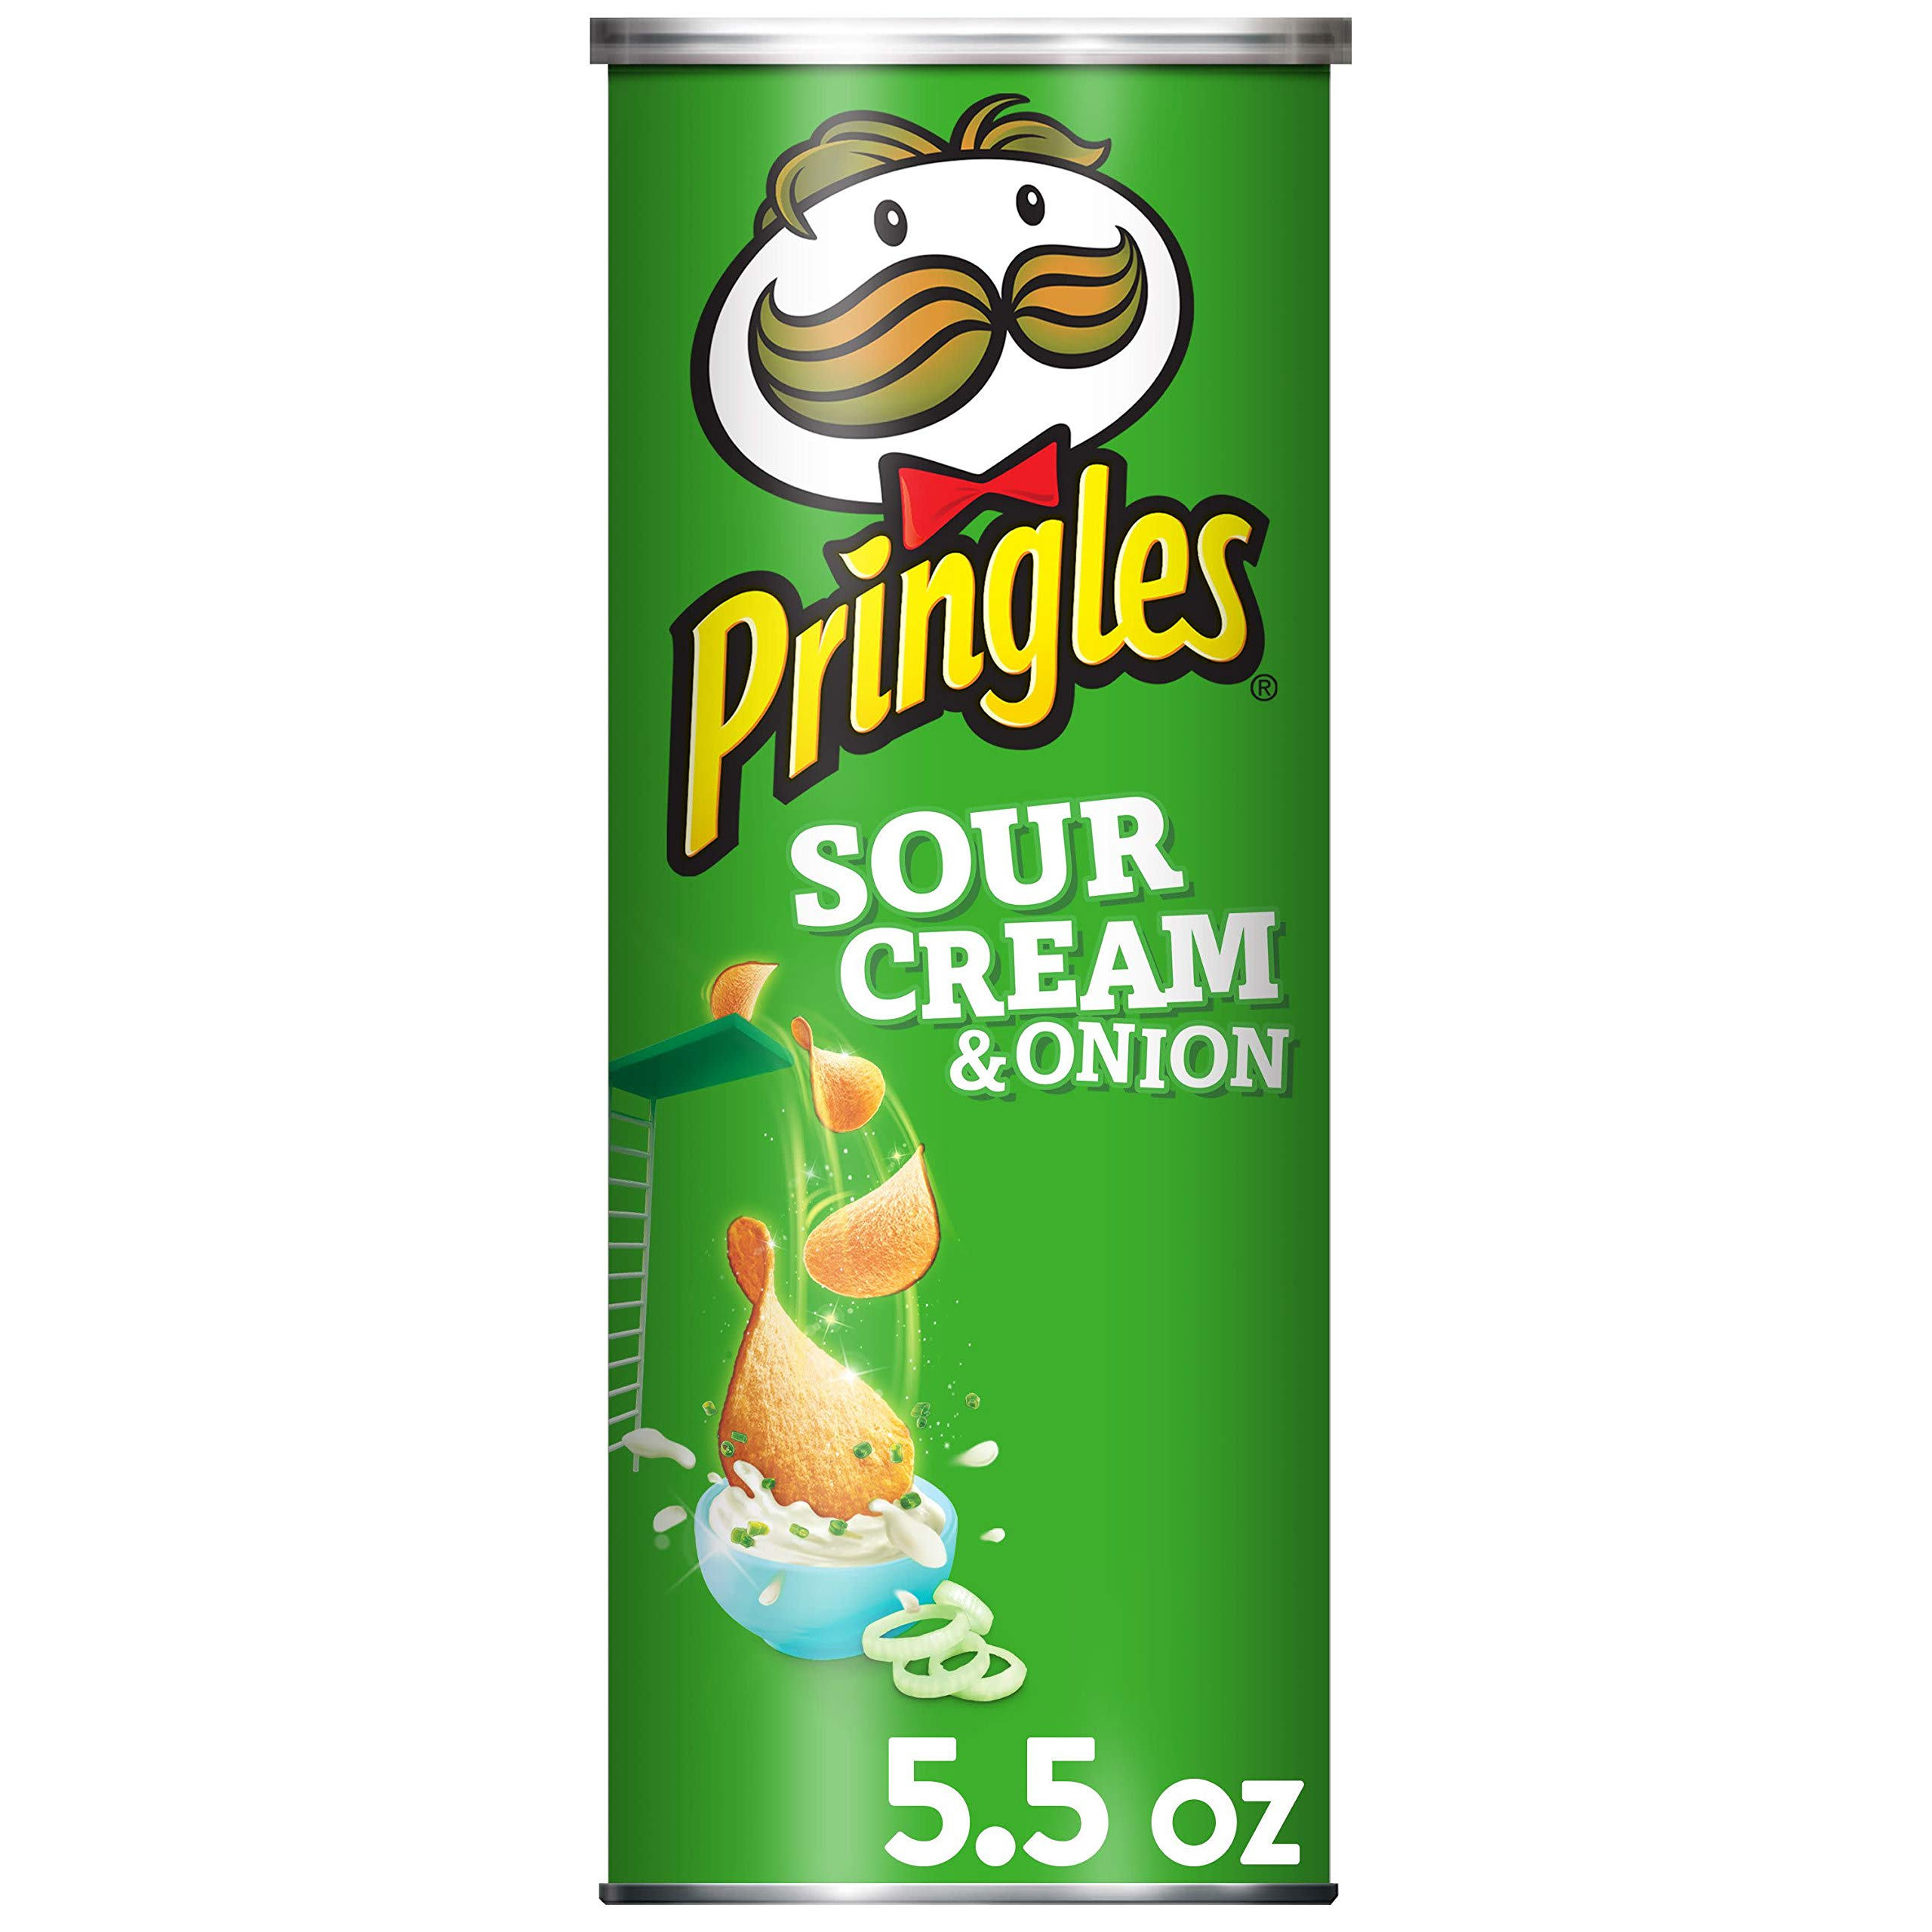 Pringles Potato Crisps Chips, Sour Cream and Onion Flavored, 5.5 oz Can